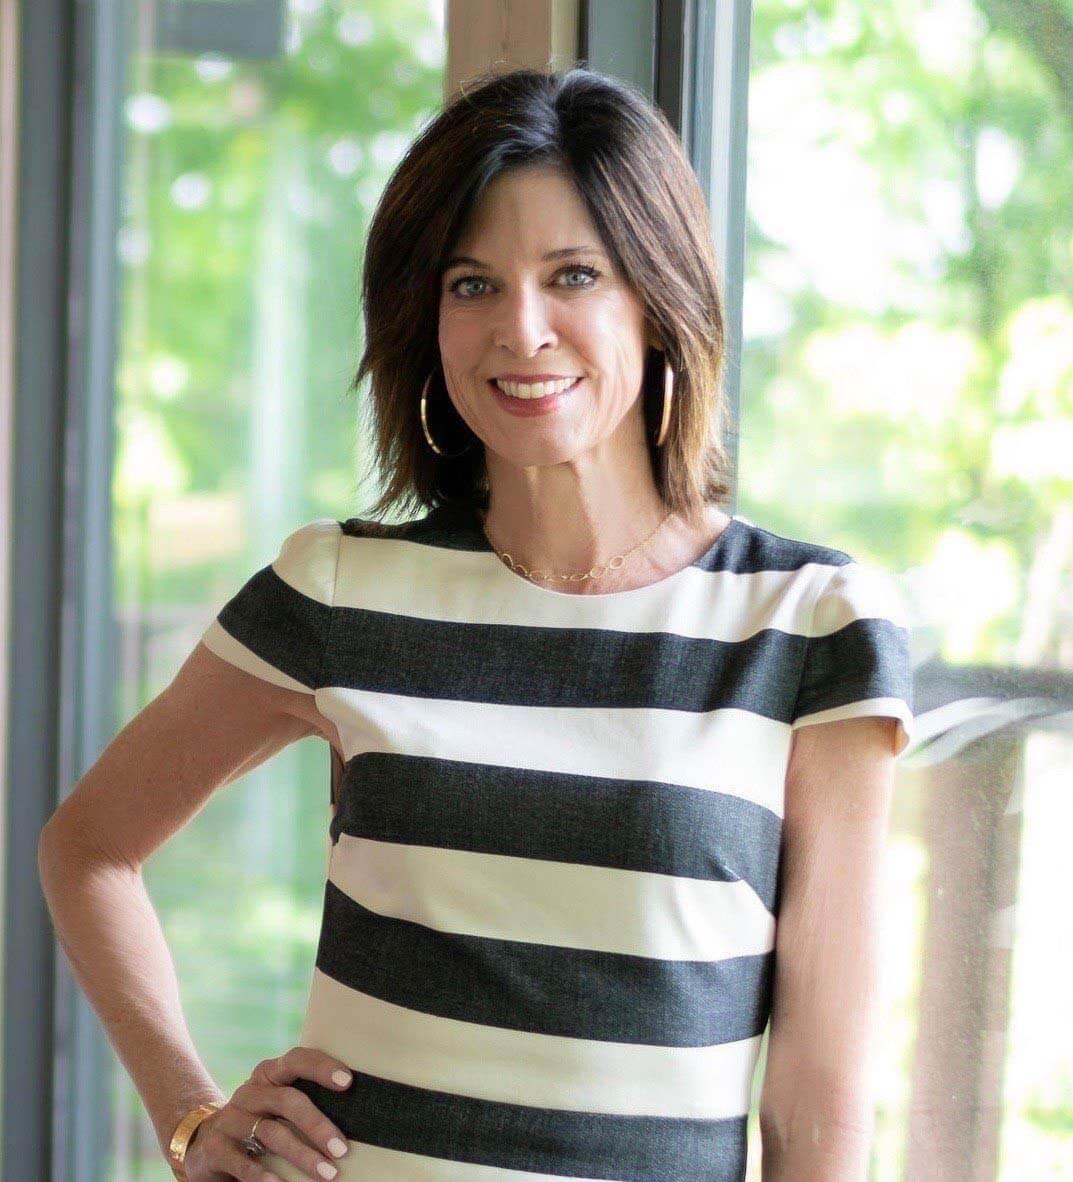 Spring fashion tastemaker, Cynthia Kelley